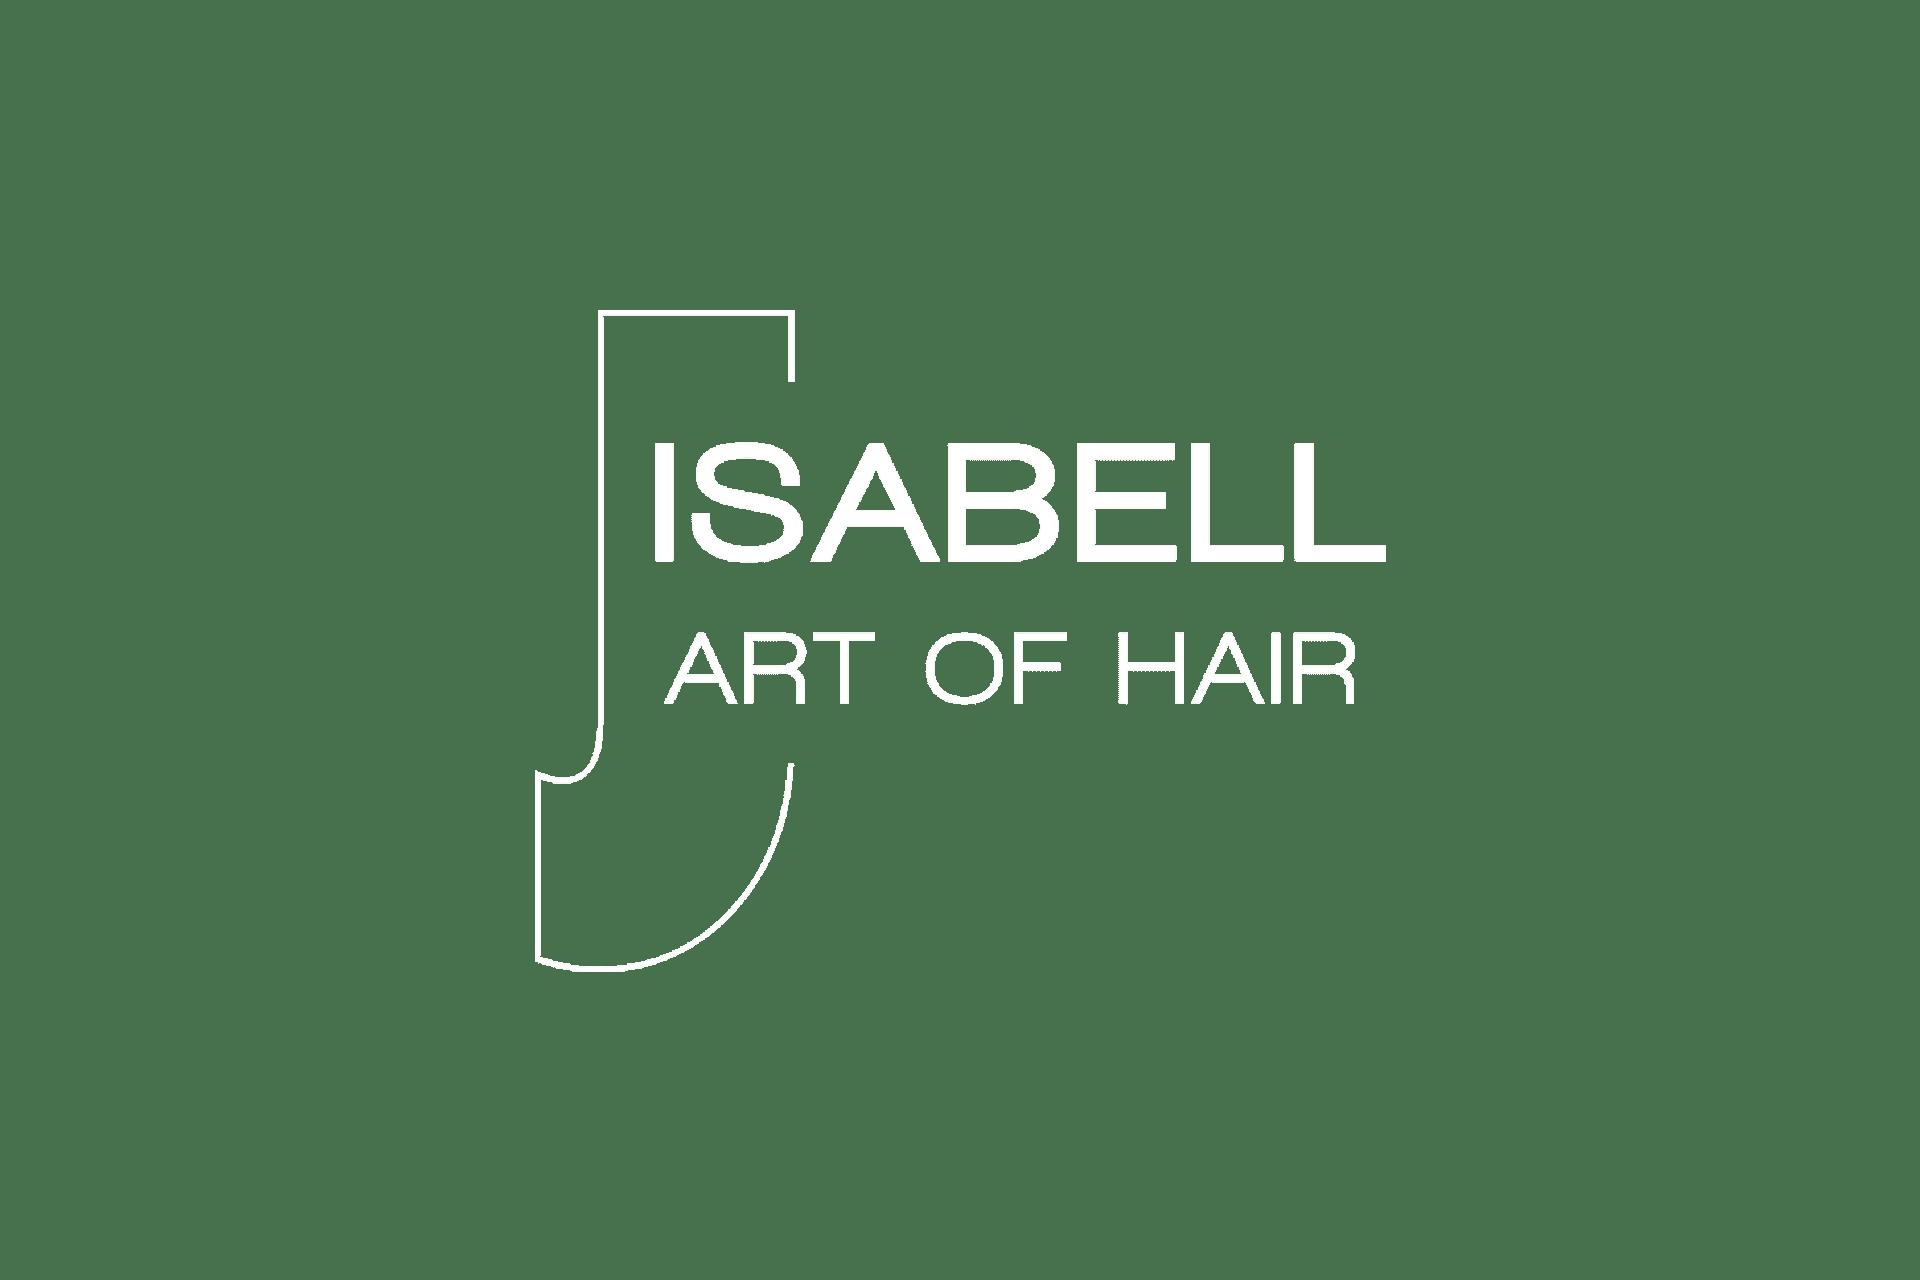 Isabell Art of Hair - Logo